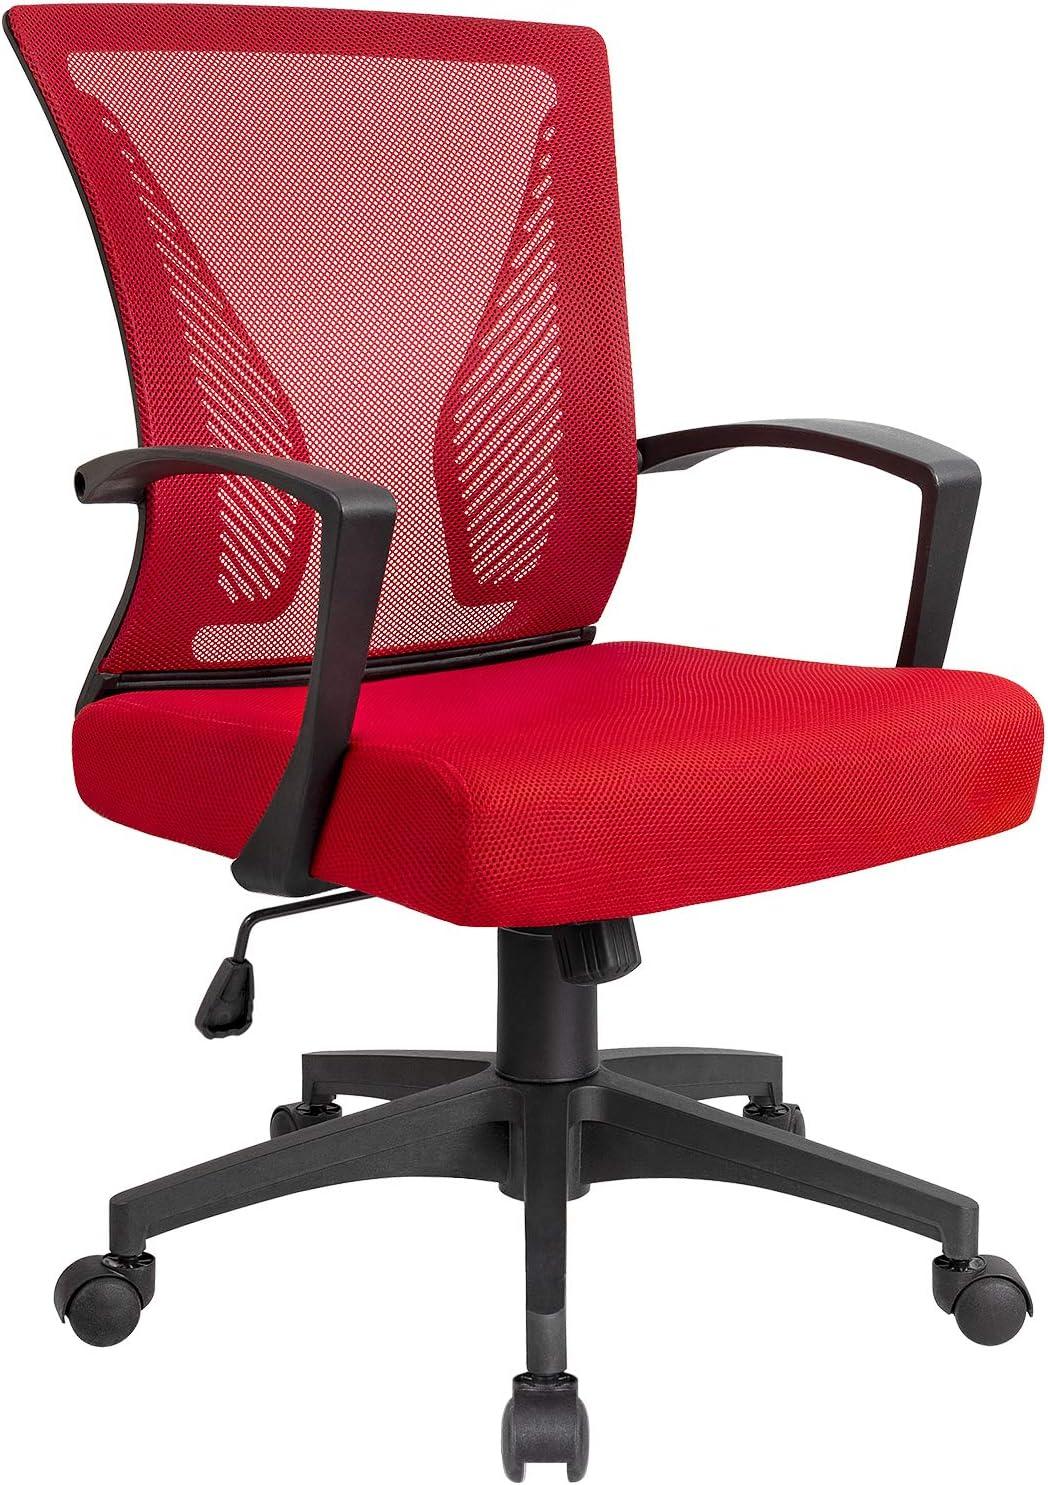 KaiMeng Office Chair Ergonomic Mesh Computer Chair, Mid Back Swilvel Desk Chair Modern Adjustable Executive Chair (Red)